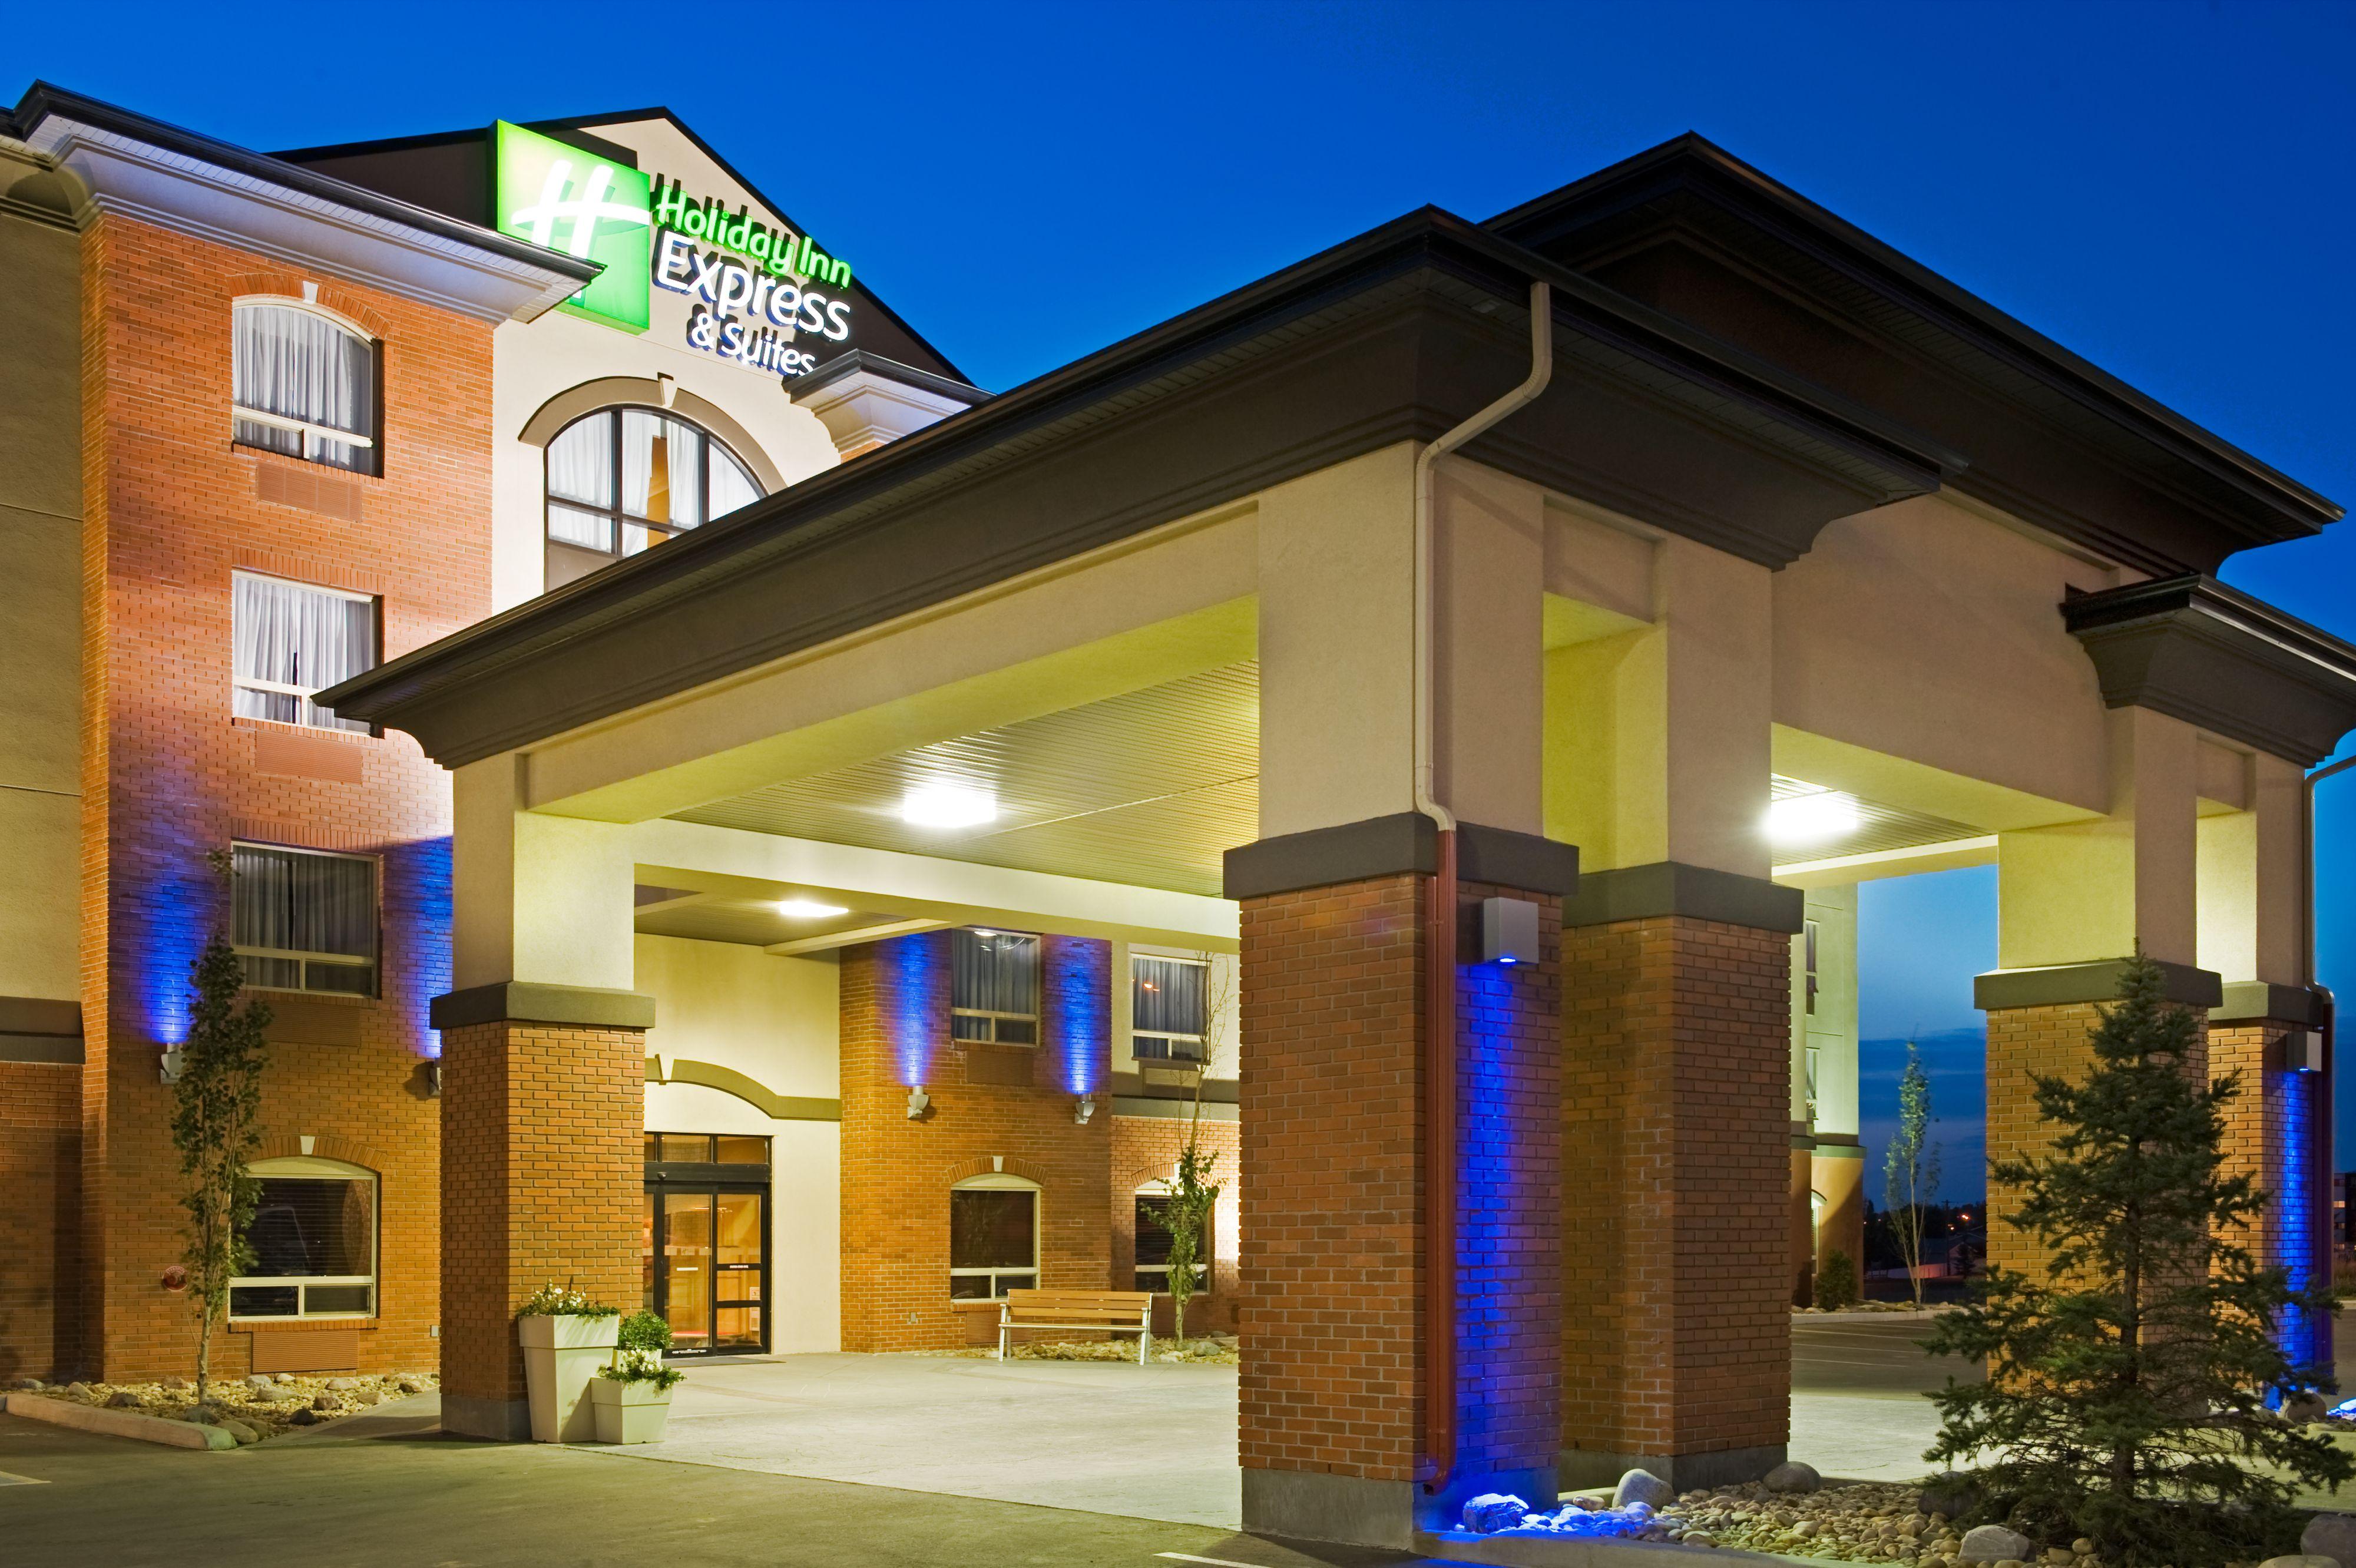 Holiday Inn Express & Suites Douglas image 5